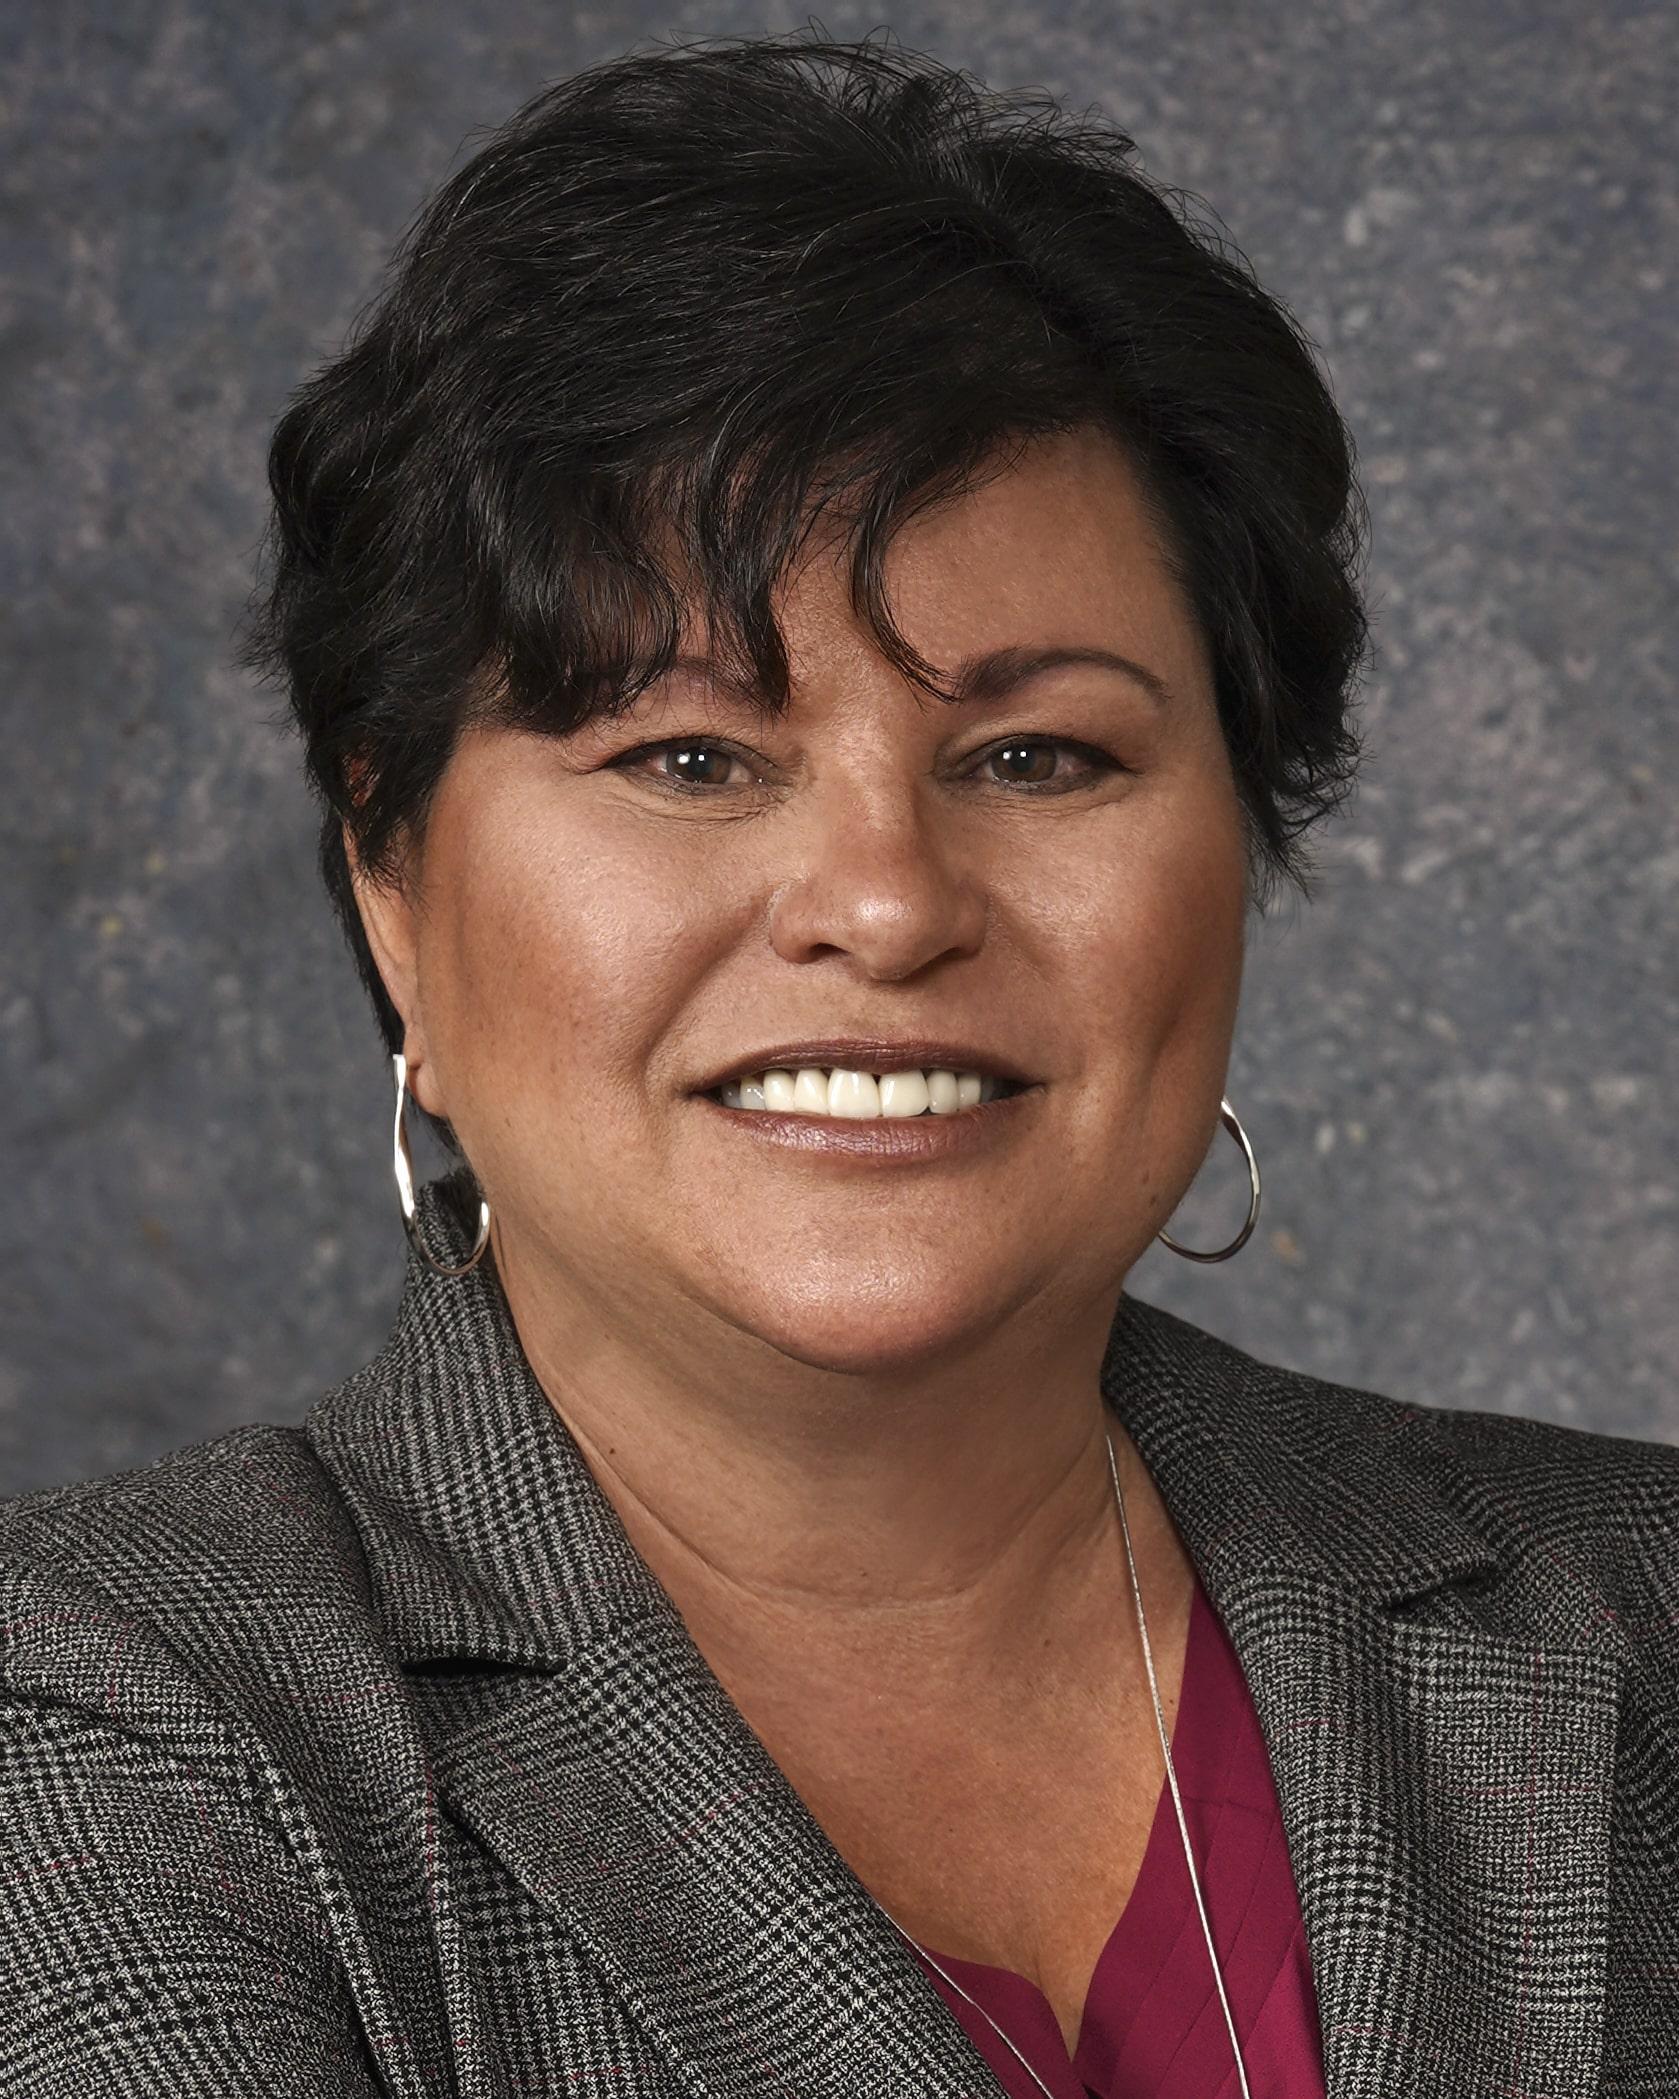 Denise De Freitas